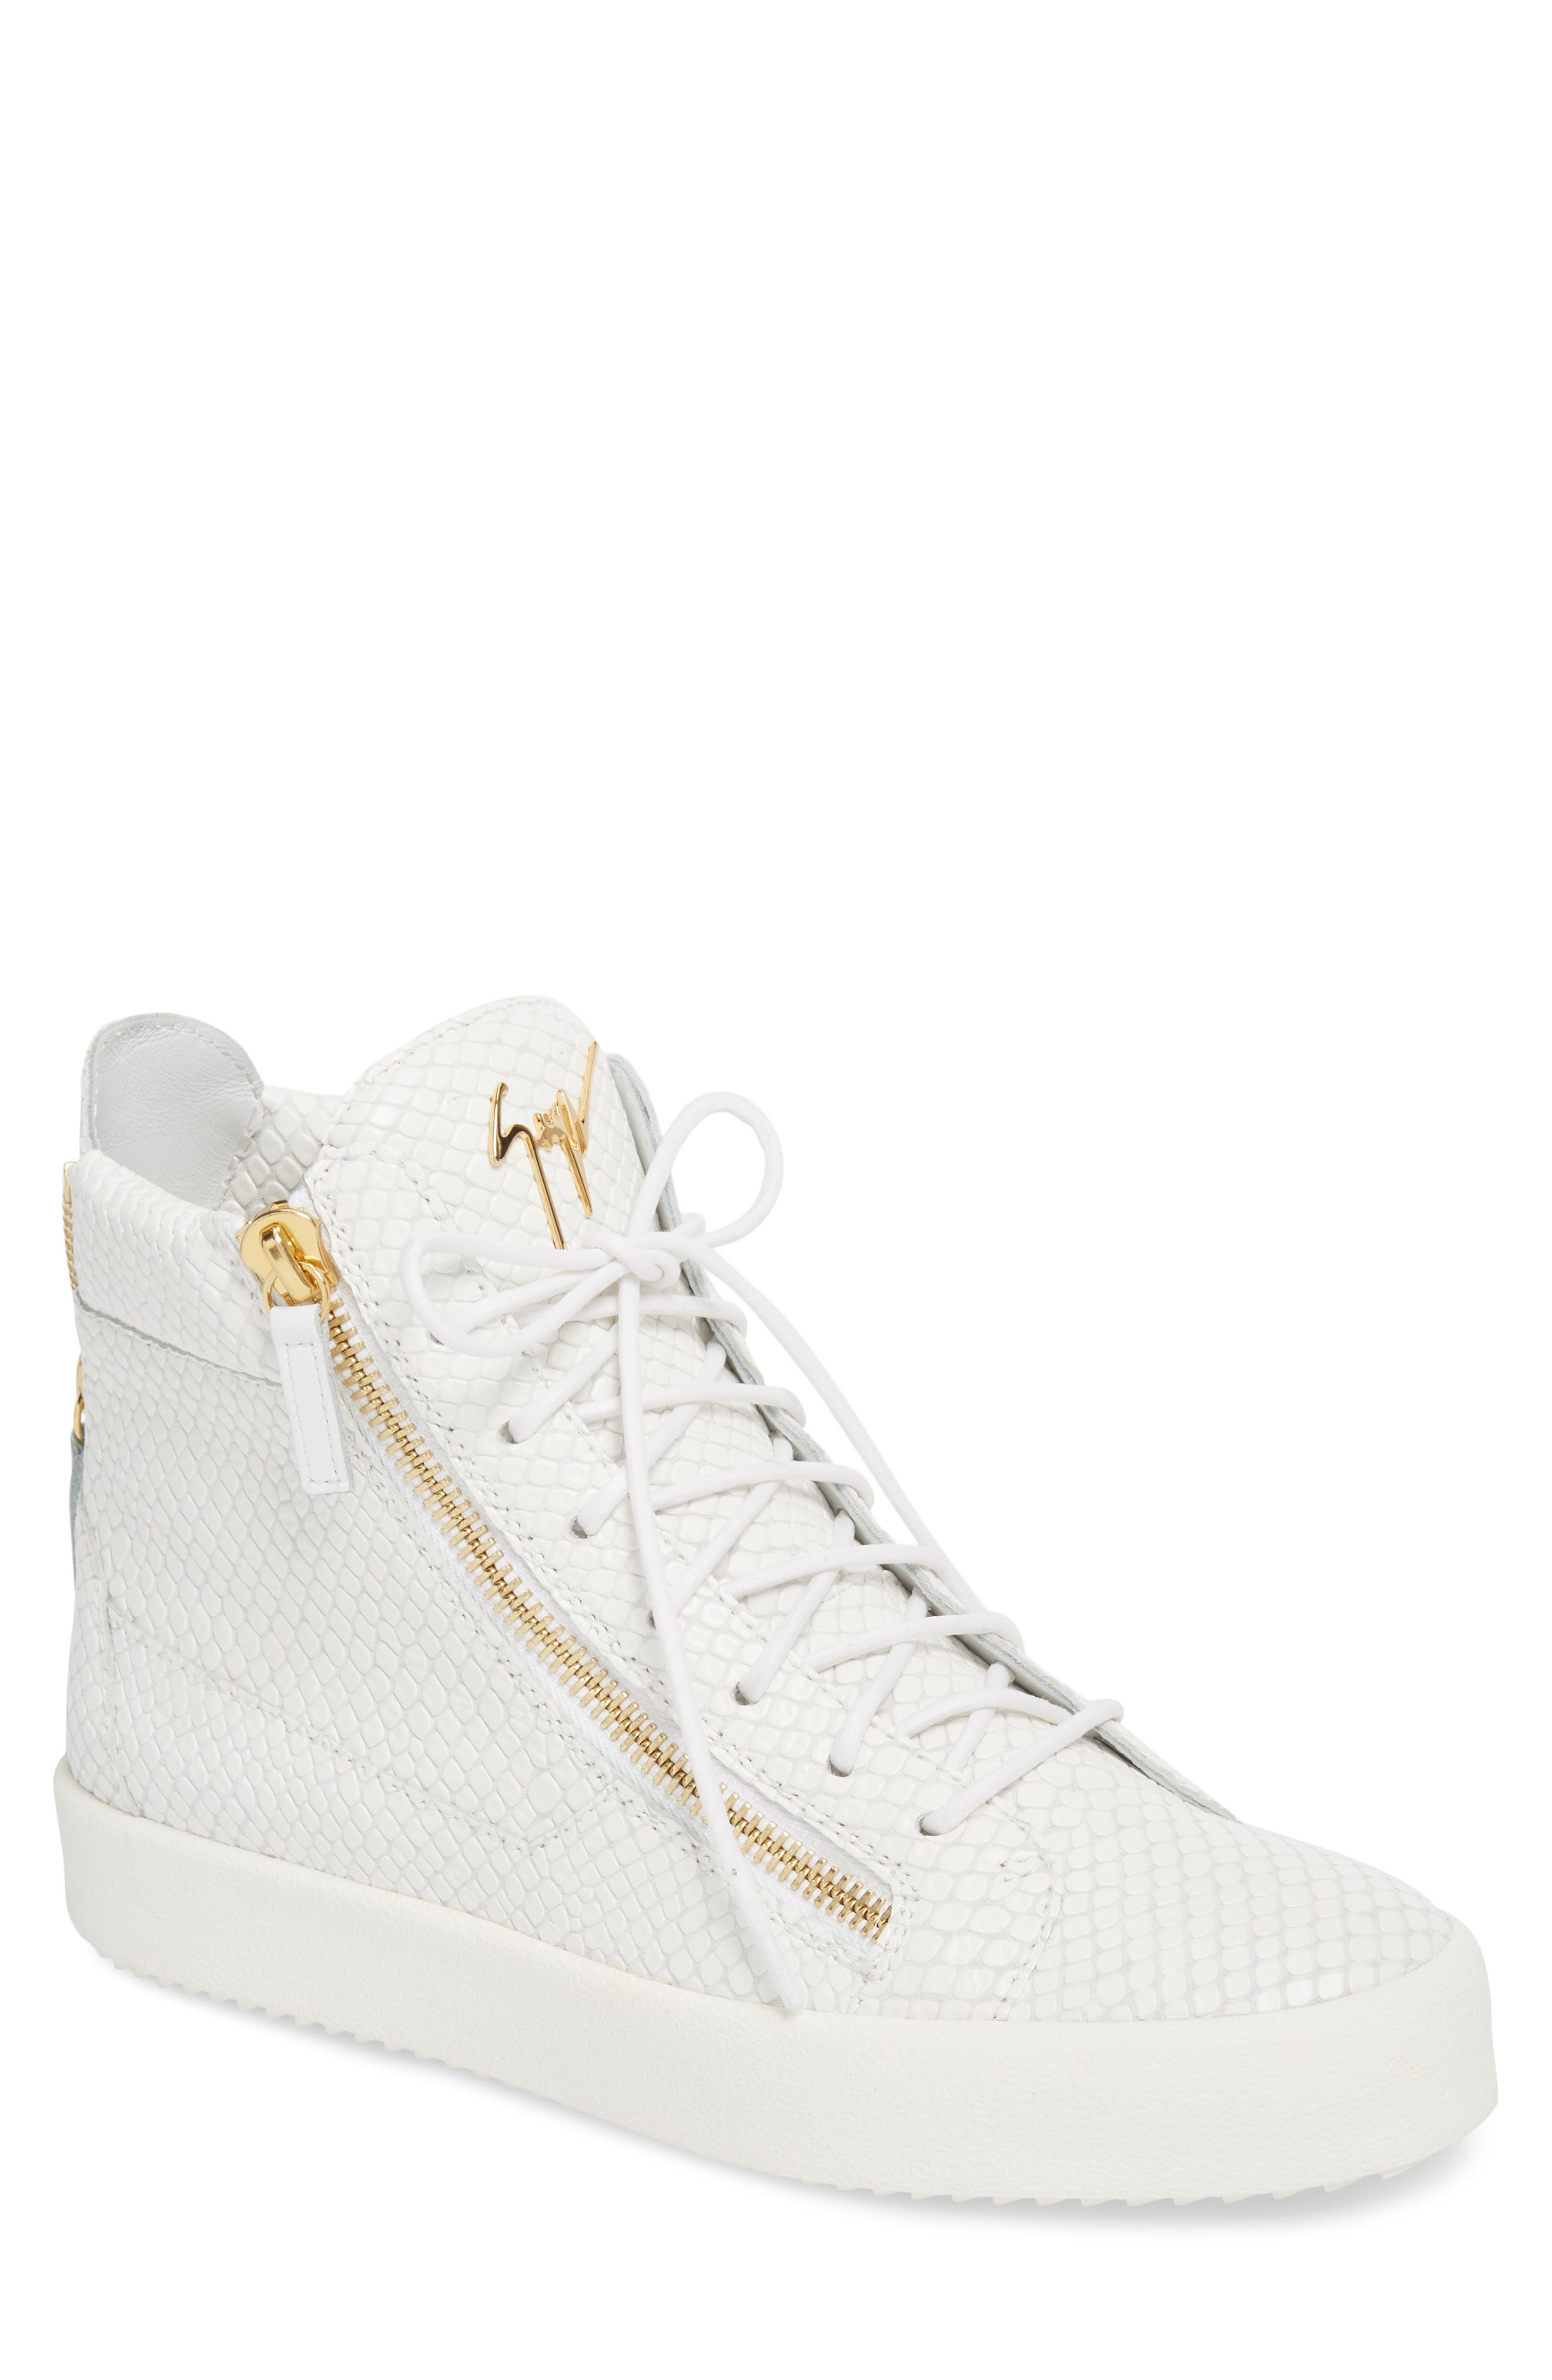 Snake Embossed High Top Sneaker,                         Main,                         color, BIANCO